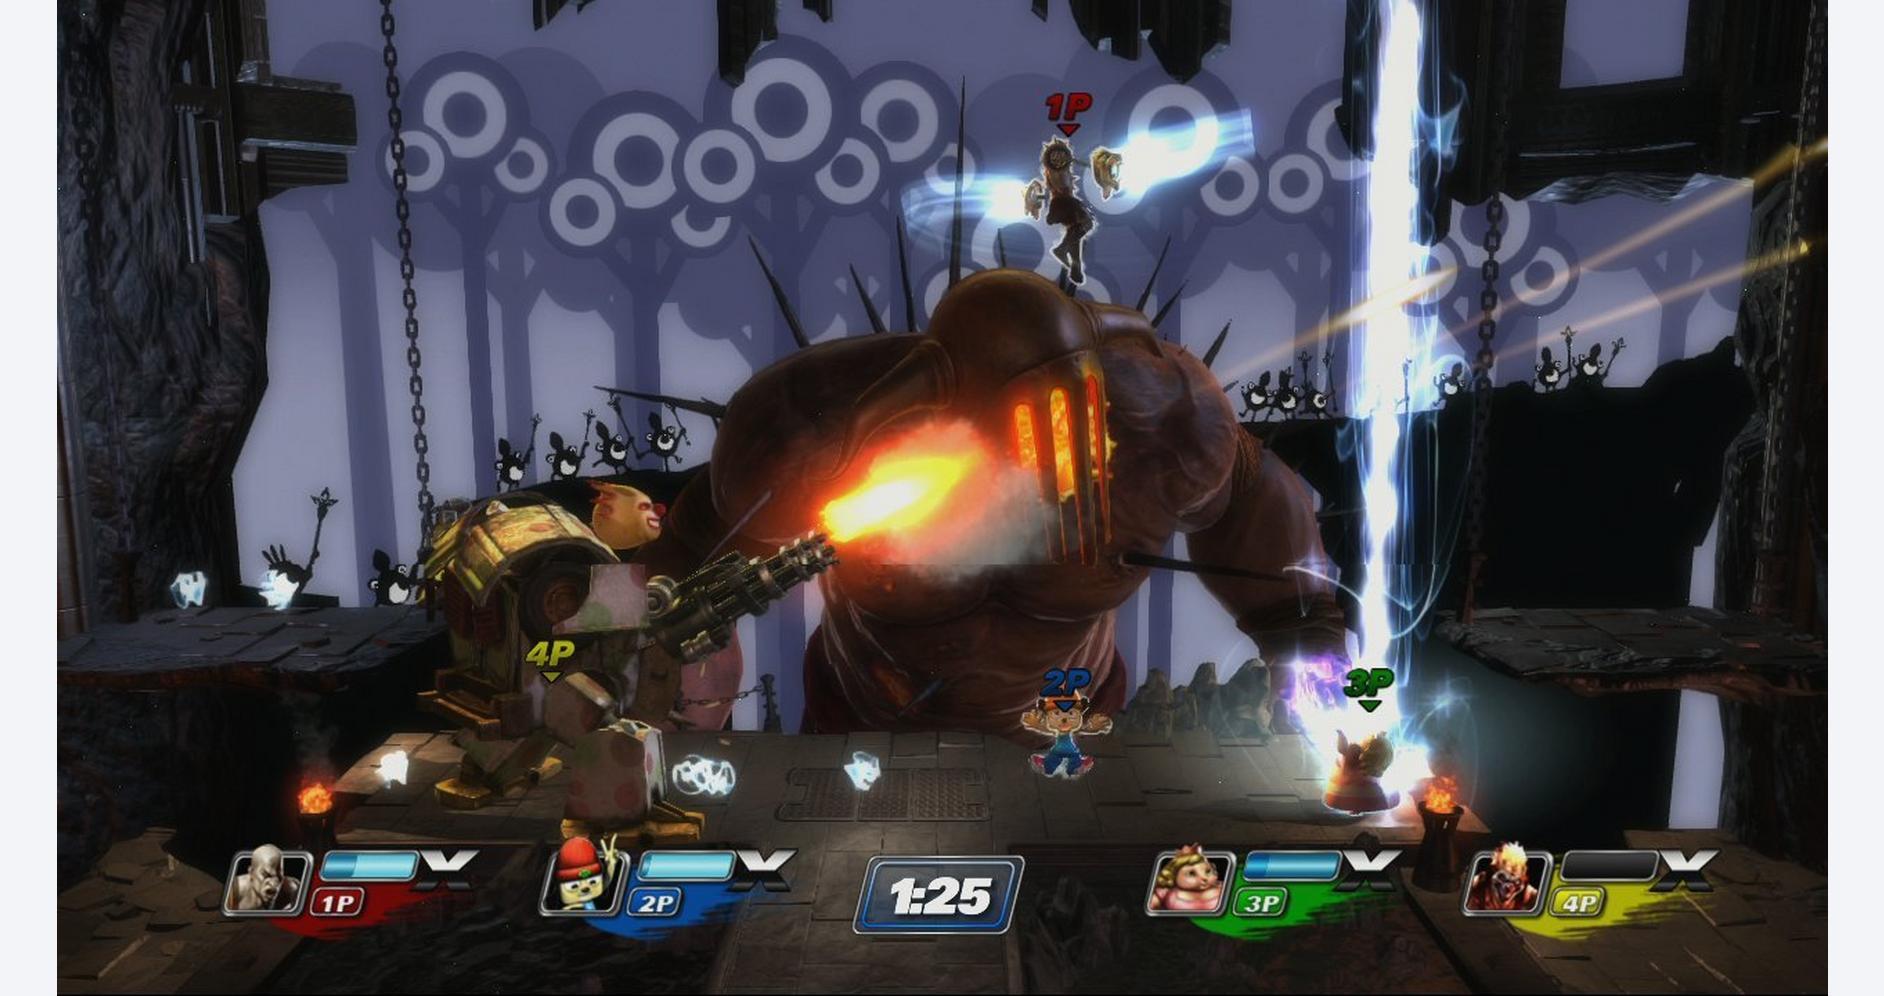 Super Smash Bros Clones - Playstation All Starts Battle Royale